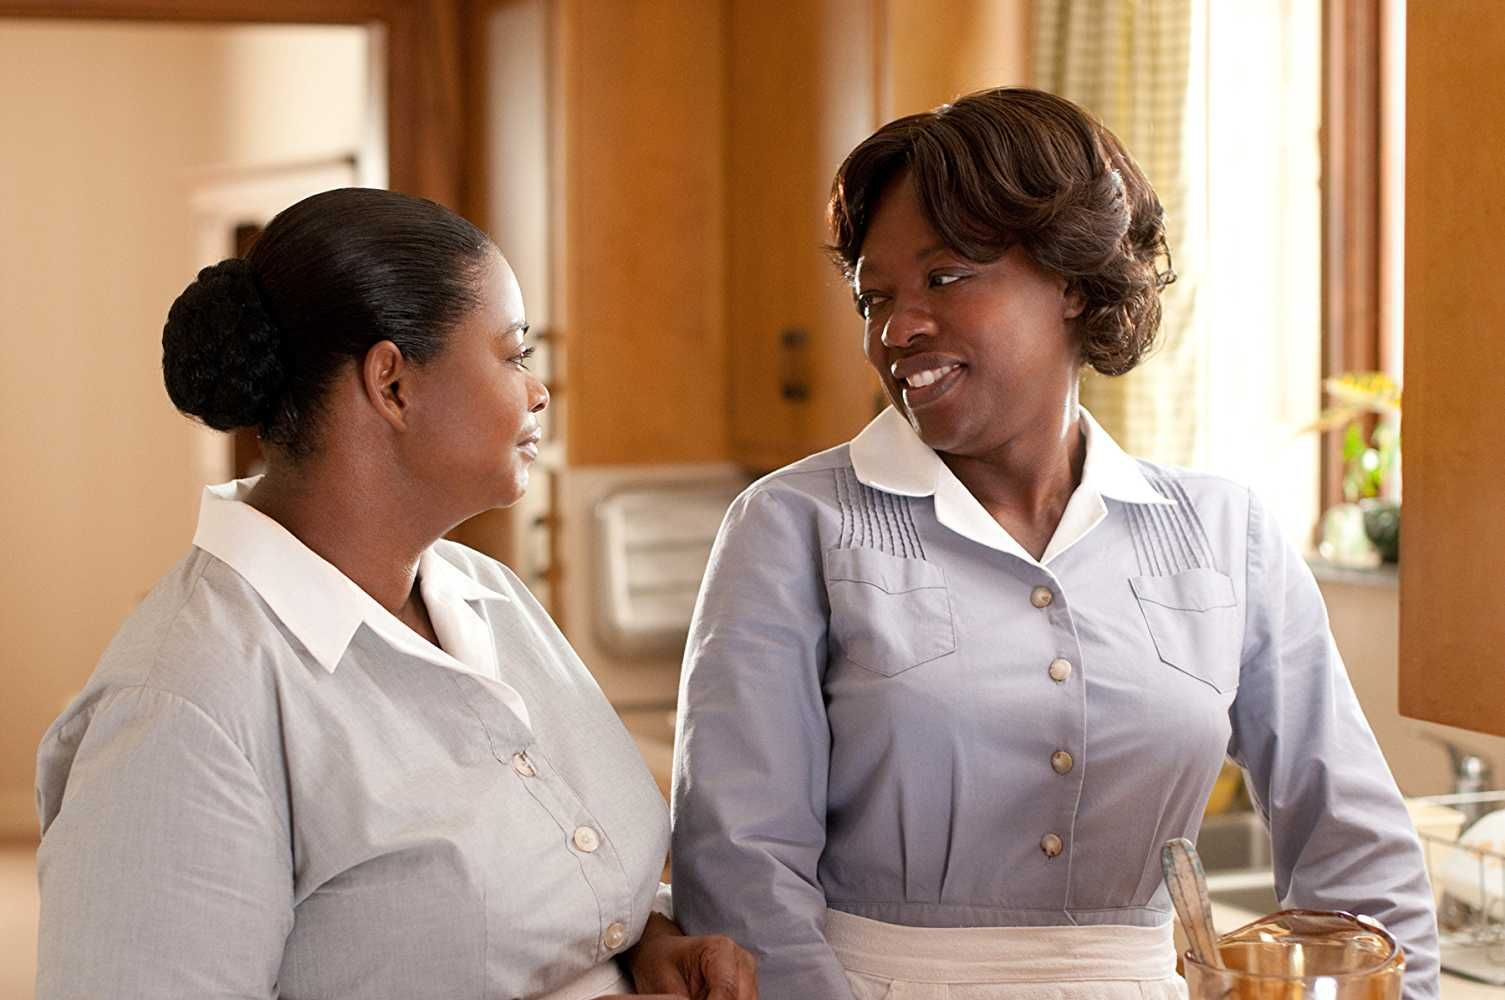 Minny Jackson (Octavia Spencer), Aibileen Clark (Viola Davis) ~ The Help  (2011) ~ Movie Stills #amusementphile | Viola davis, Octavia spencer,  Octavia